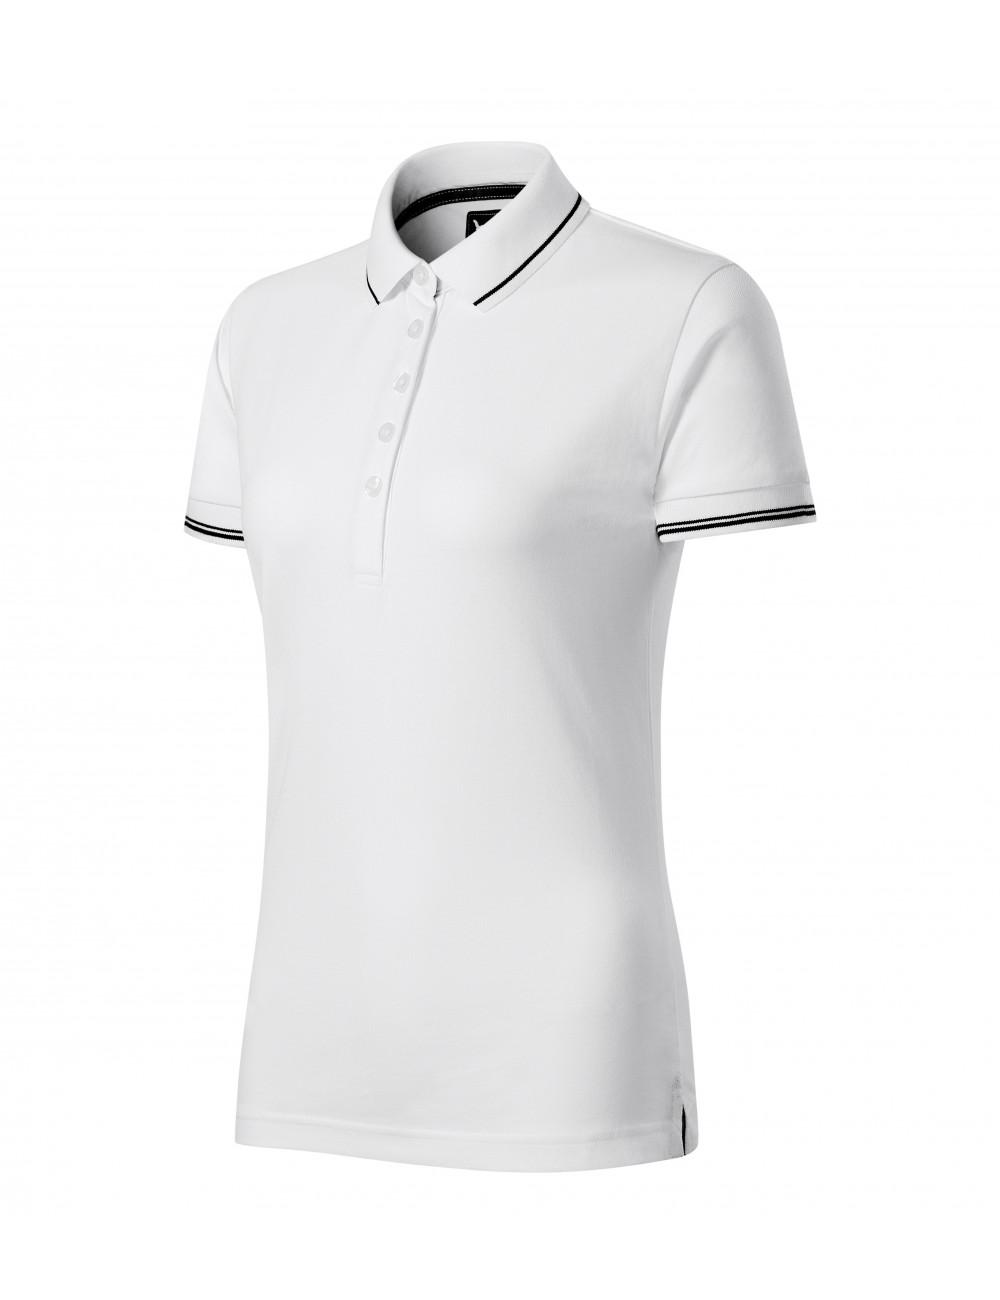 Adler MALFINIPREMIUM Koszulka polo damska Perfection plain 253 biały